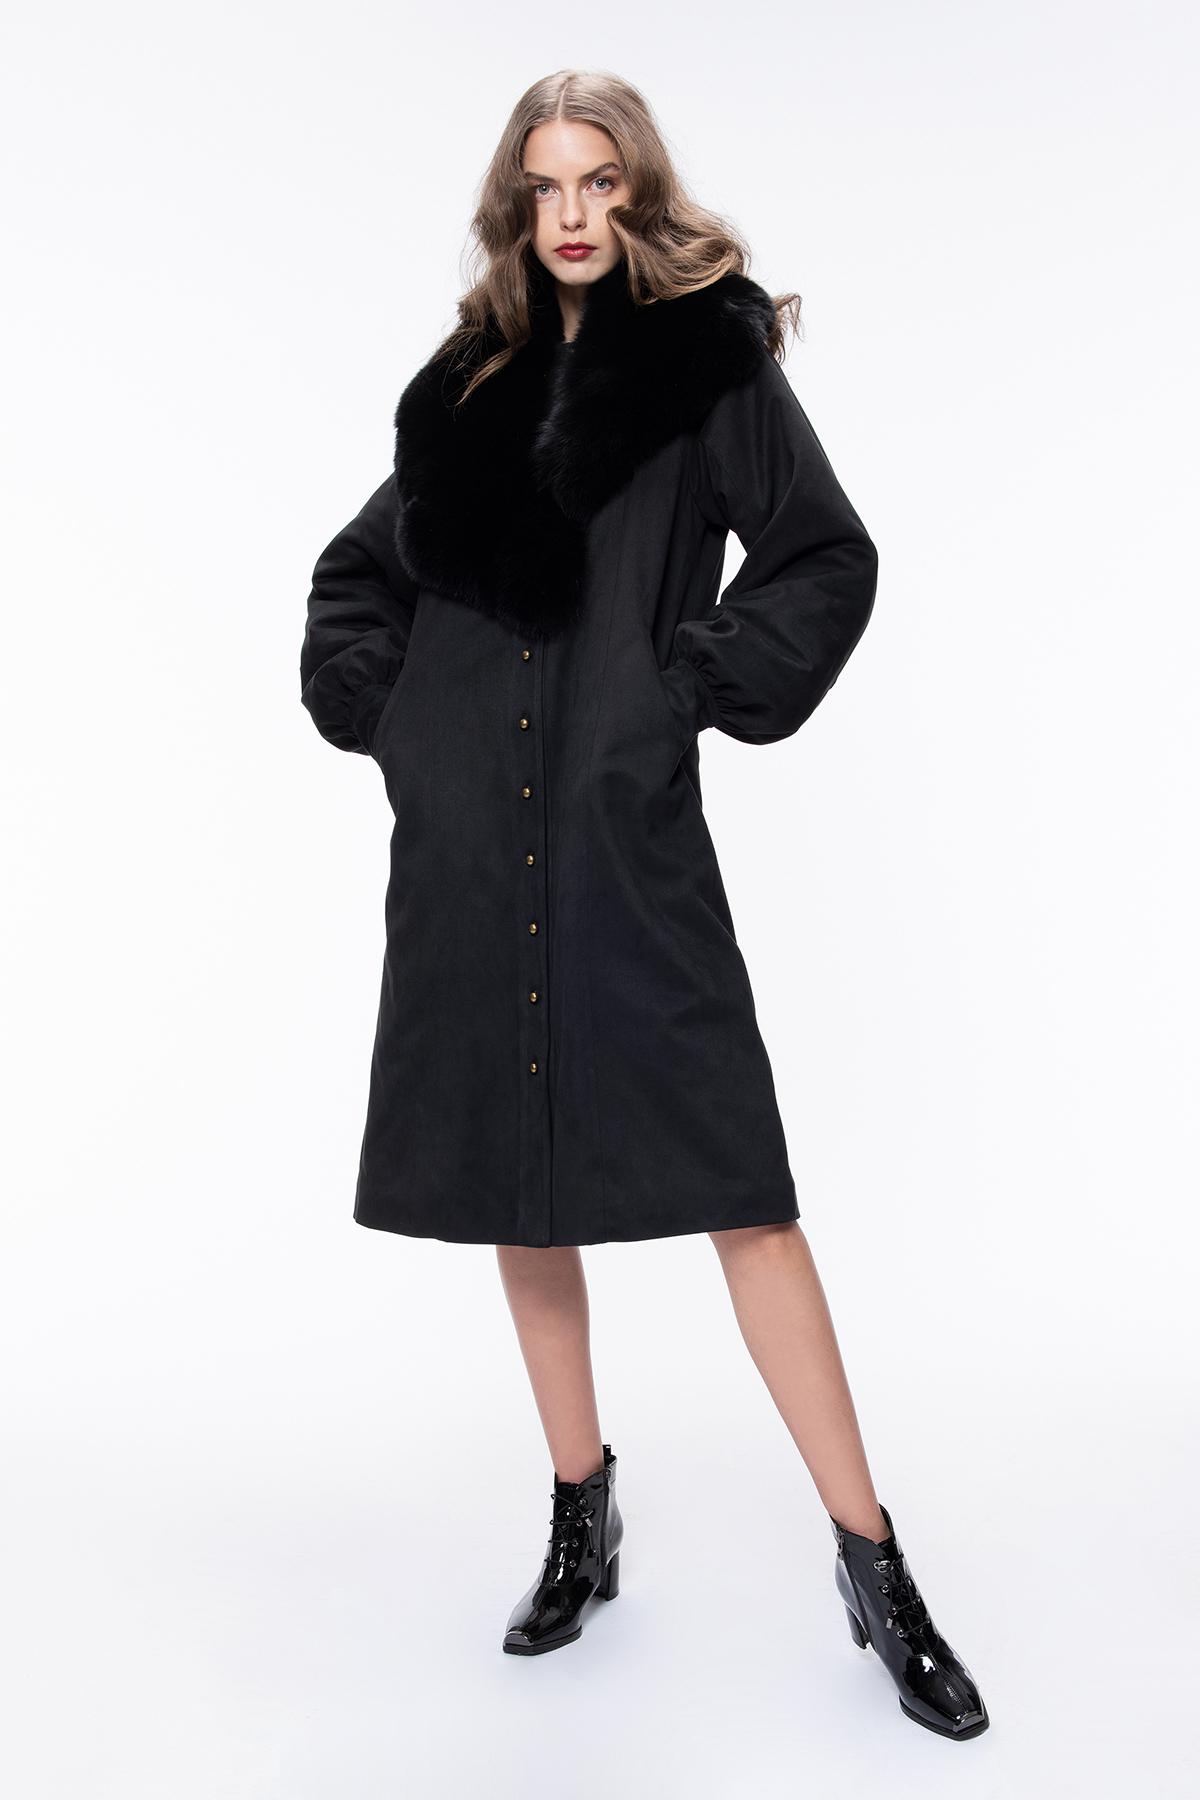 Long Black Fur Coat